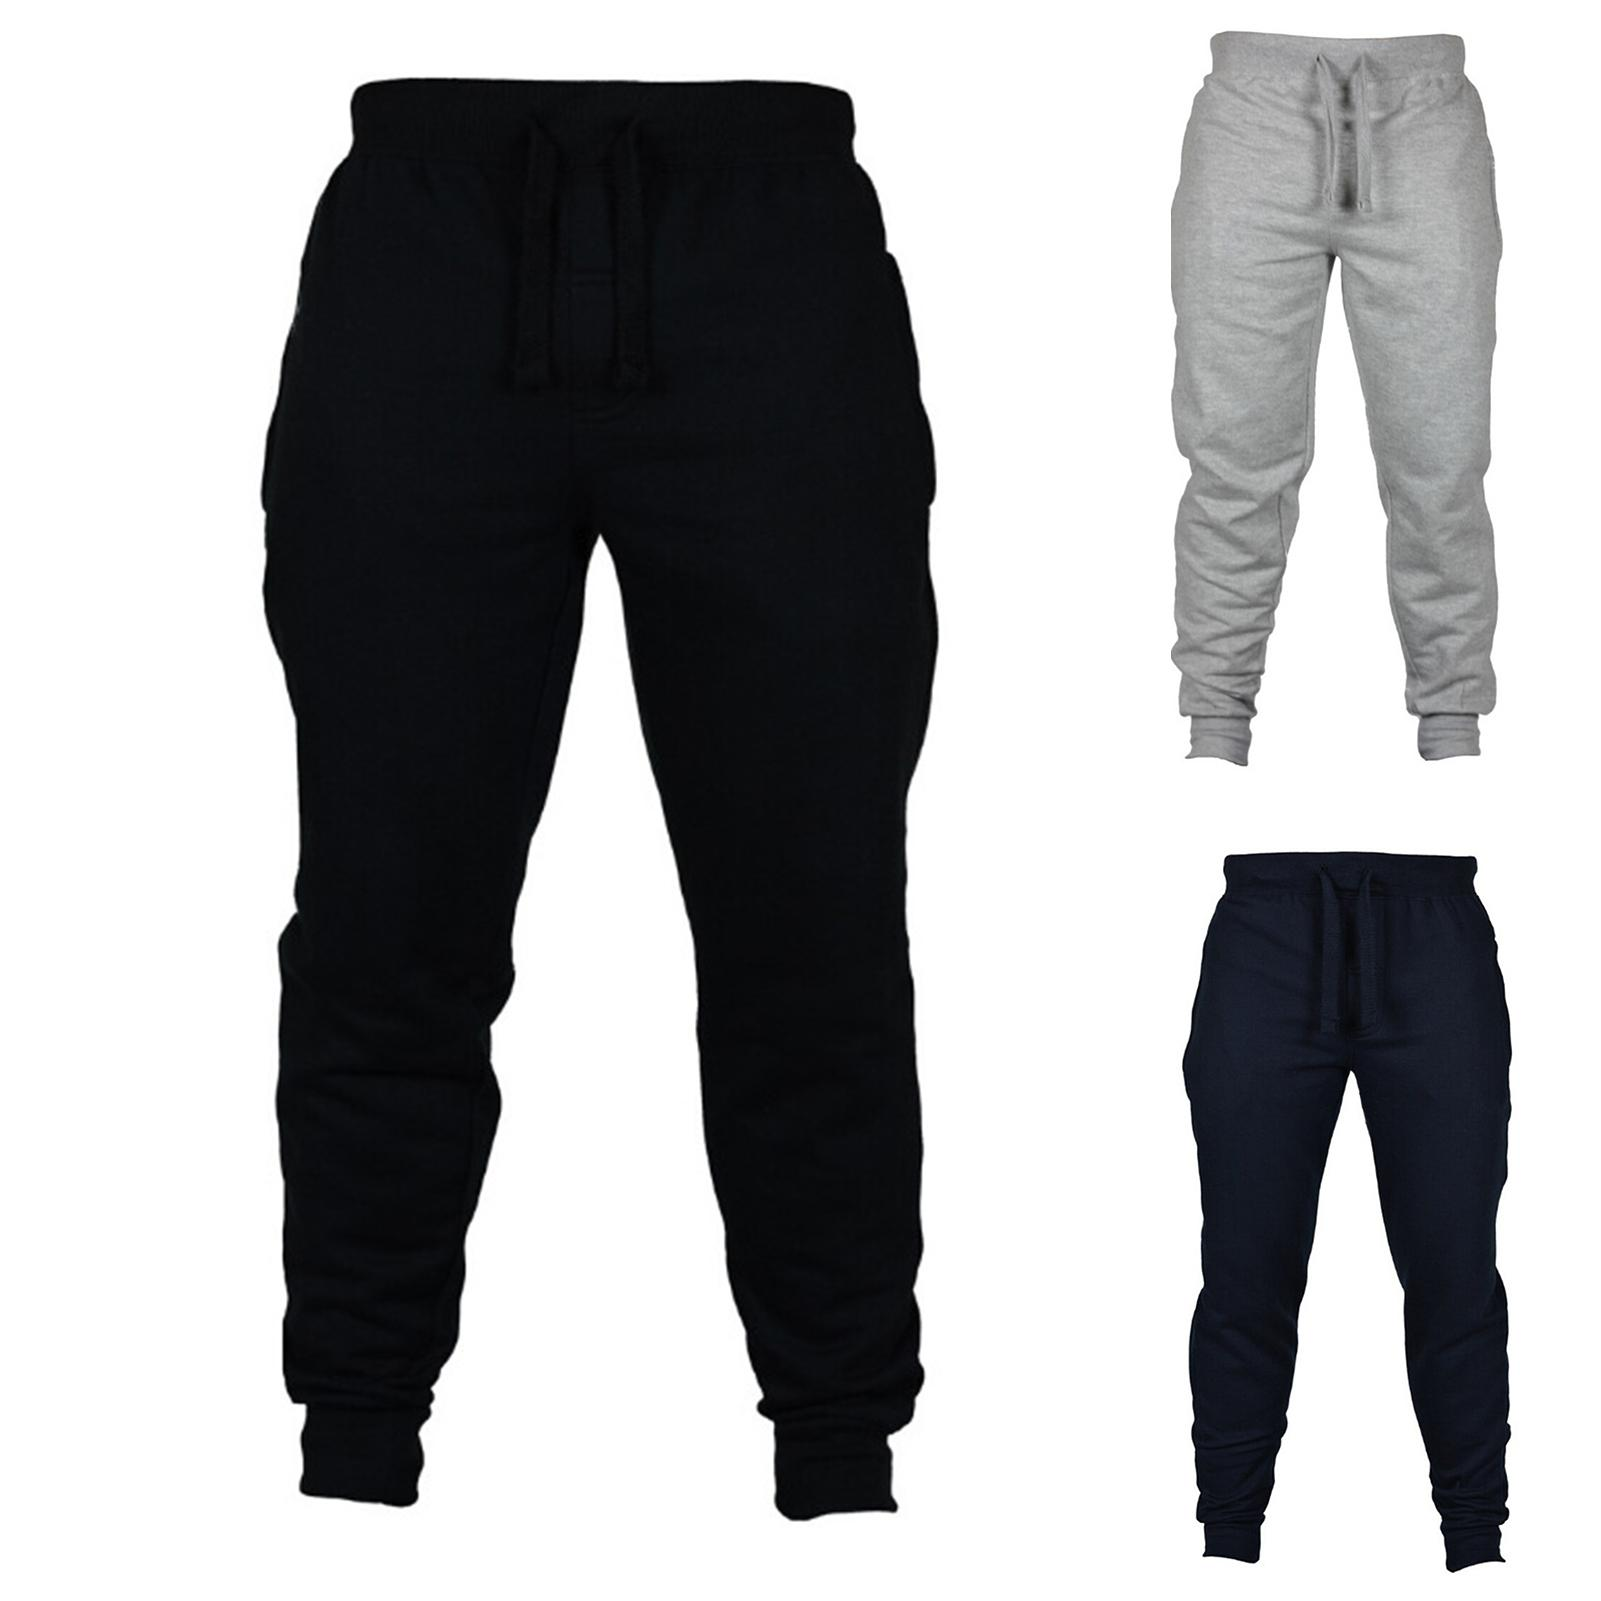 Blk Boys Cricket Sports Trousers Breathable Pants Bottoms Adjustable Waist